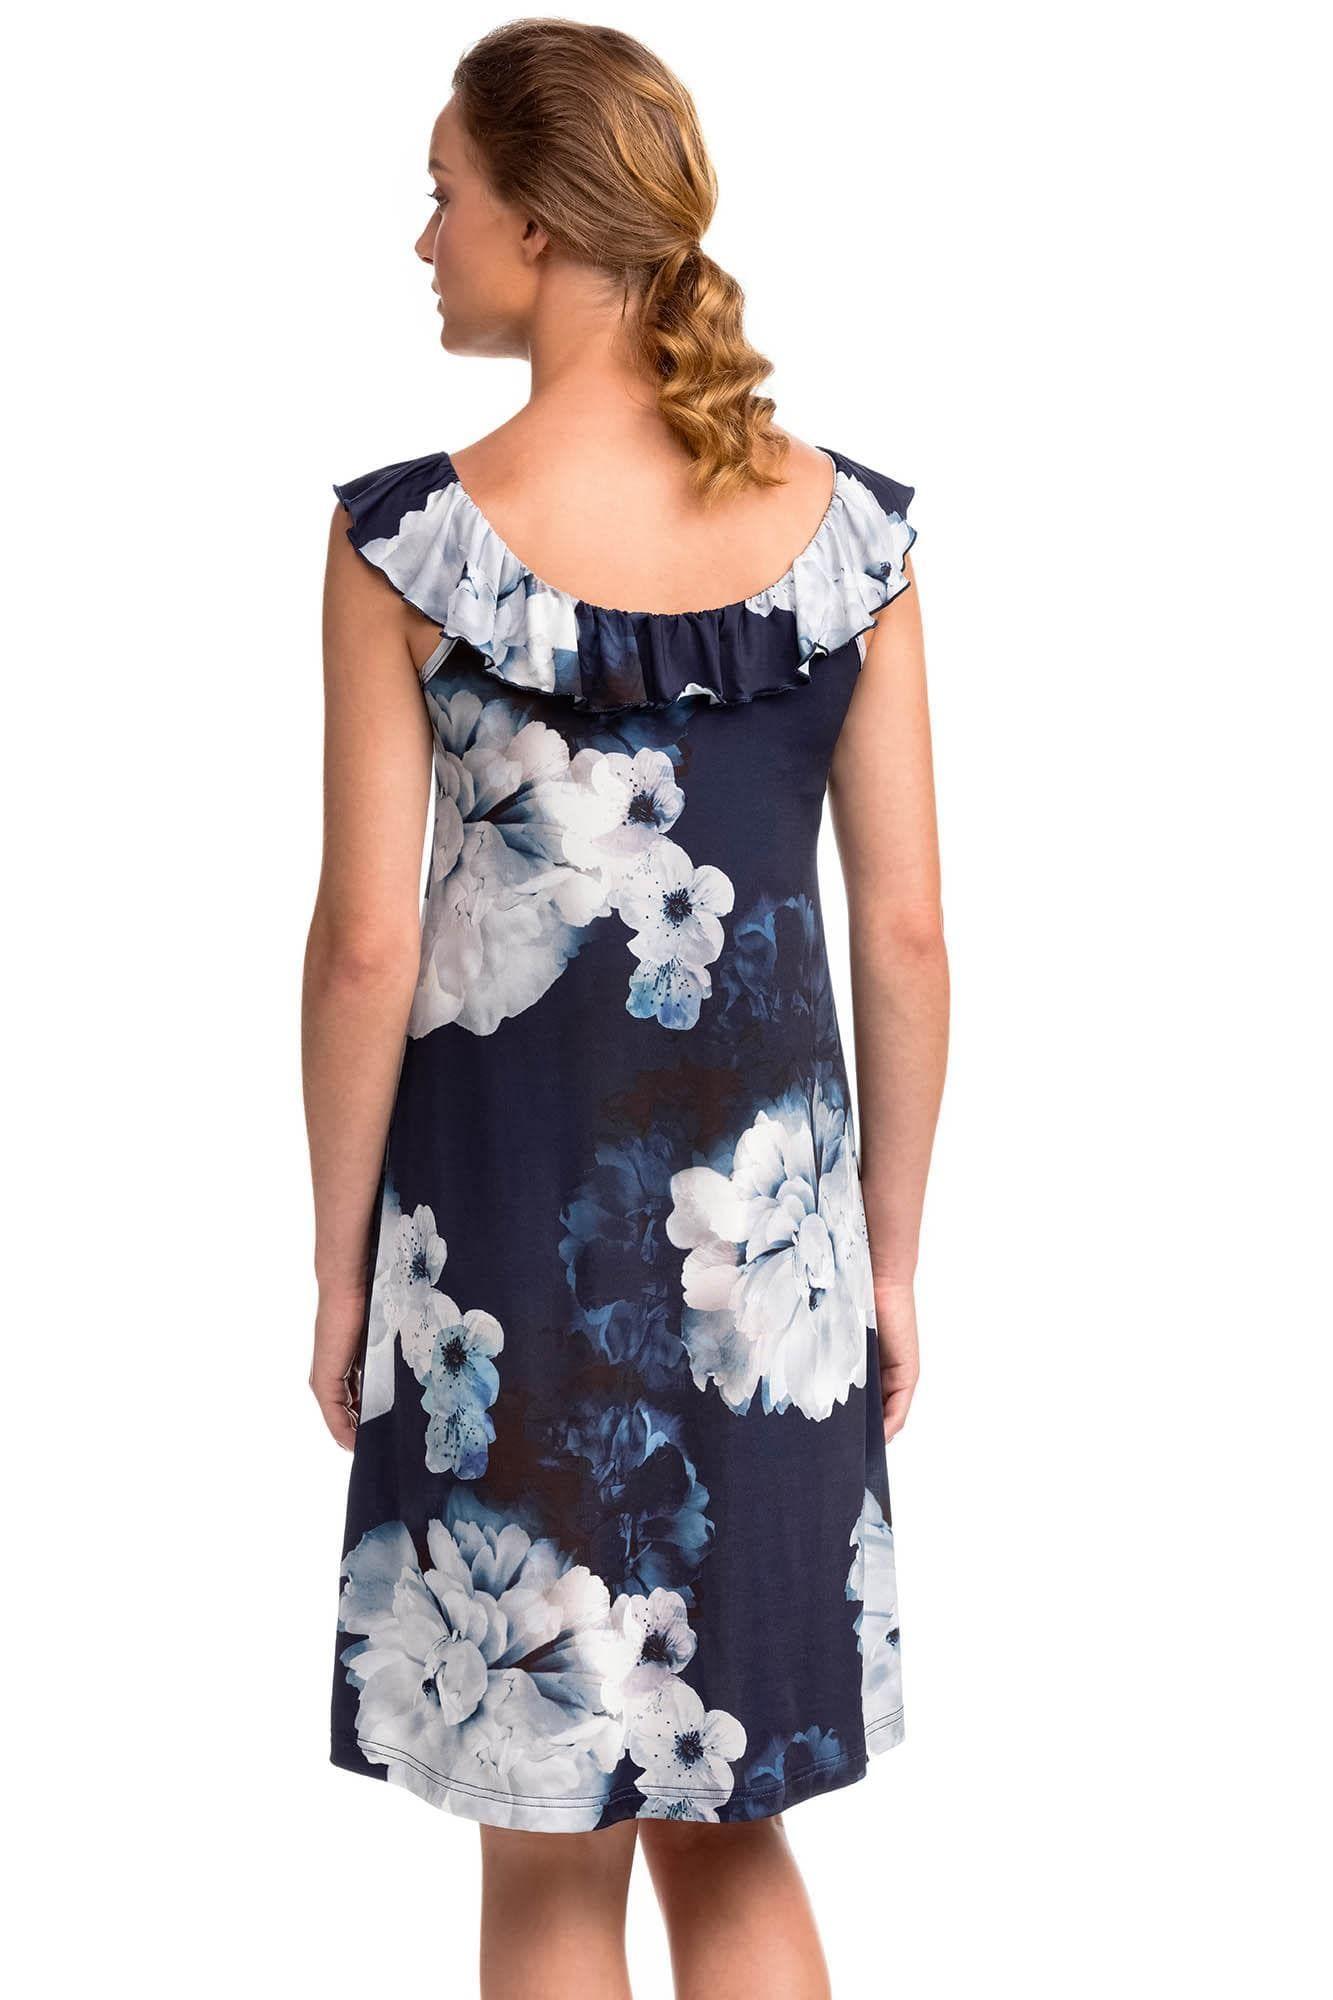 Sleeveless Dress with Frill